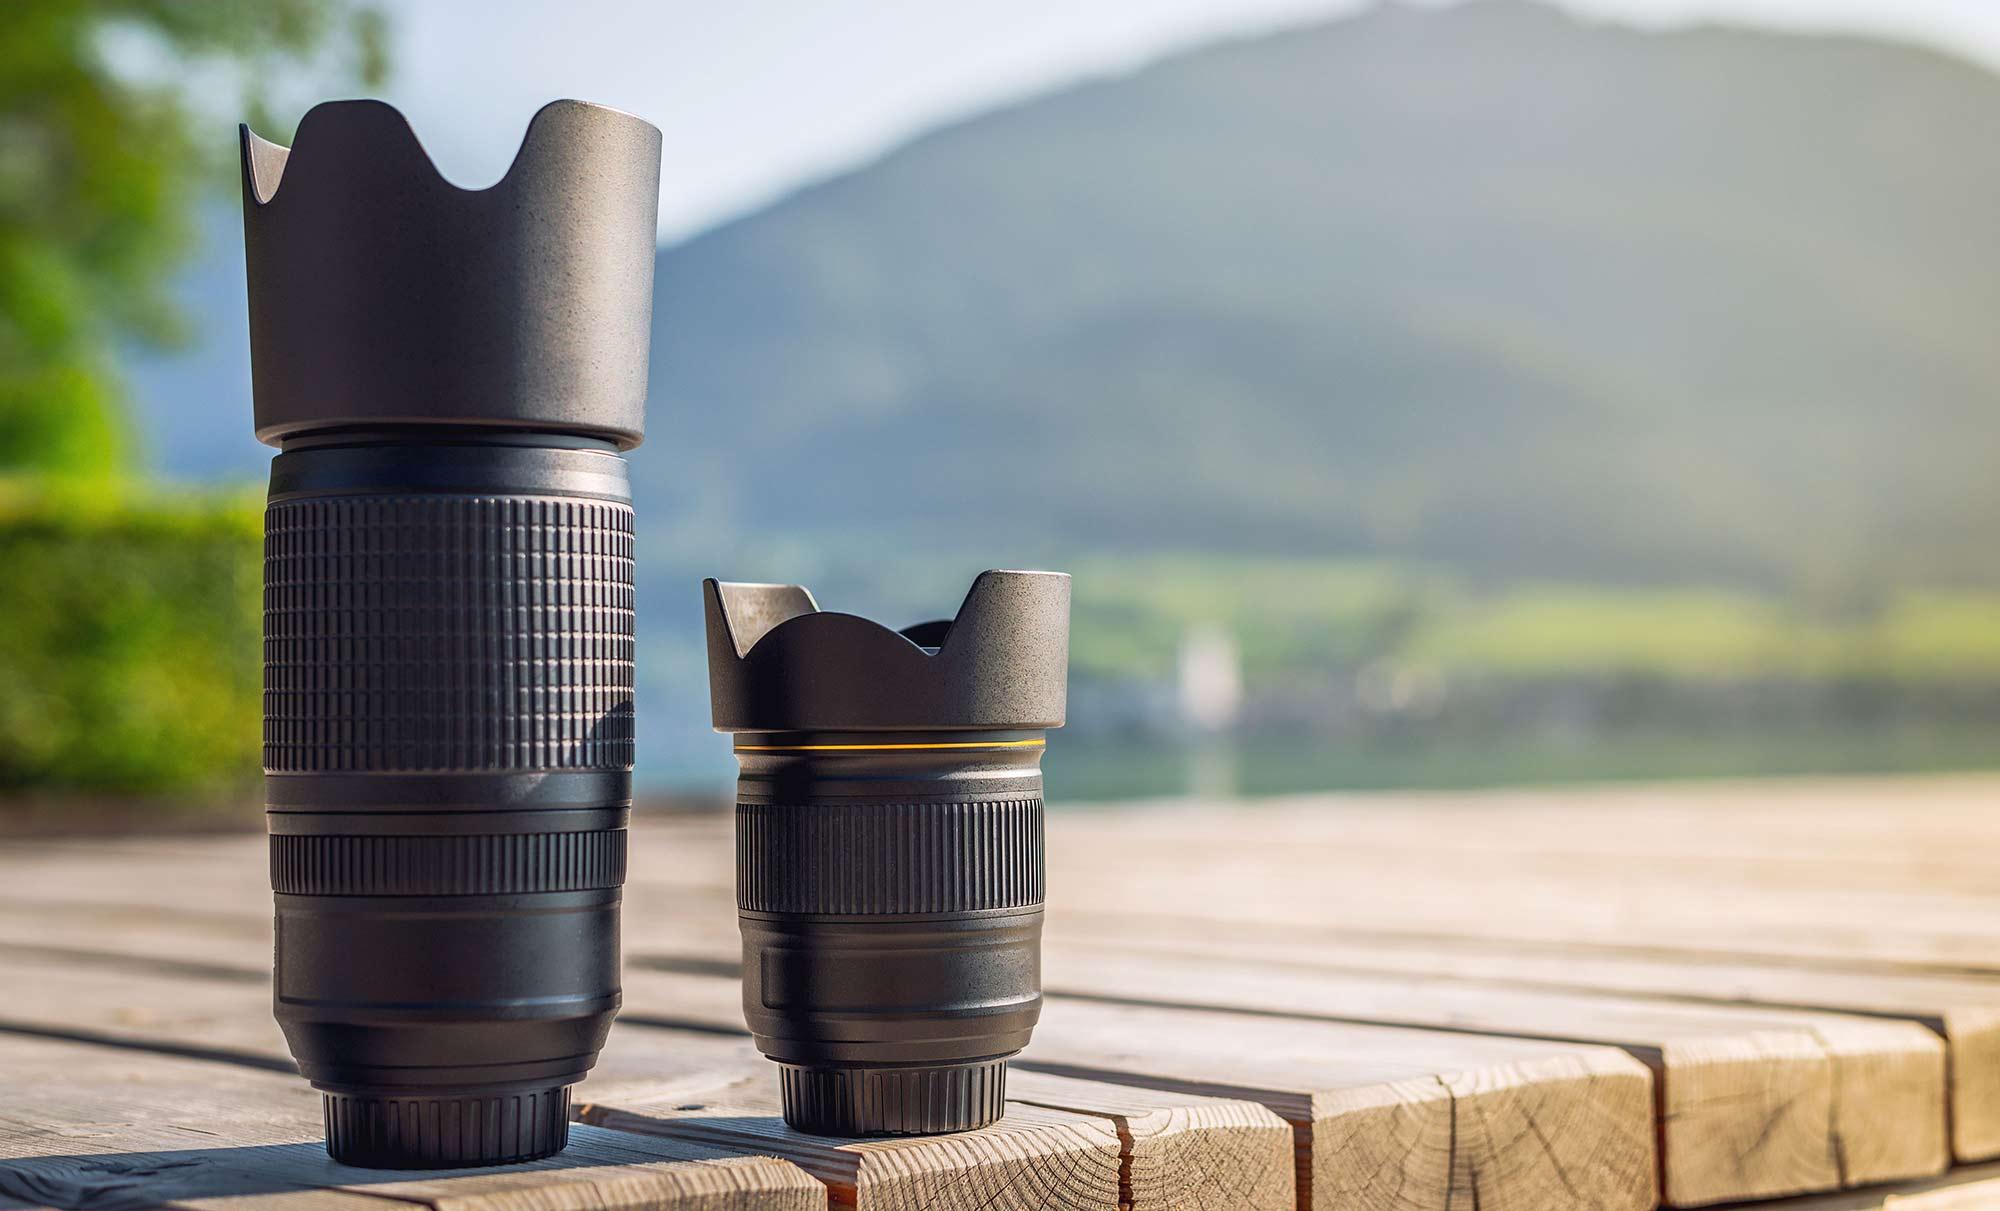 Landscape photography with kit lens (18-55mm) - Lui